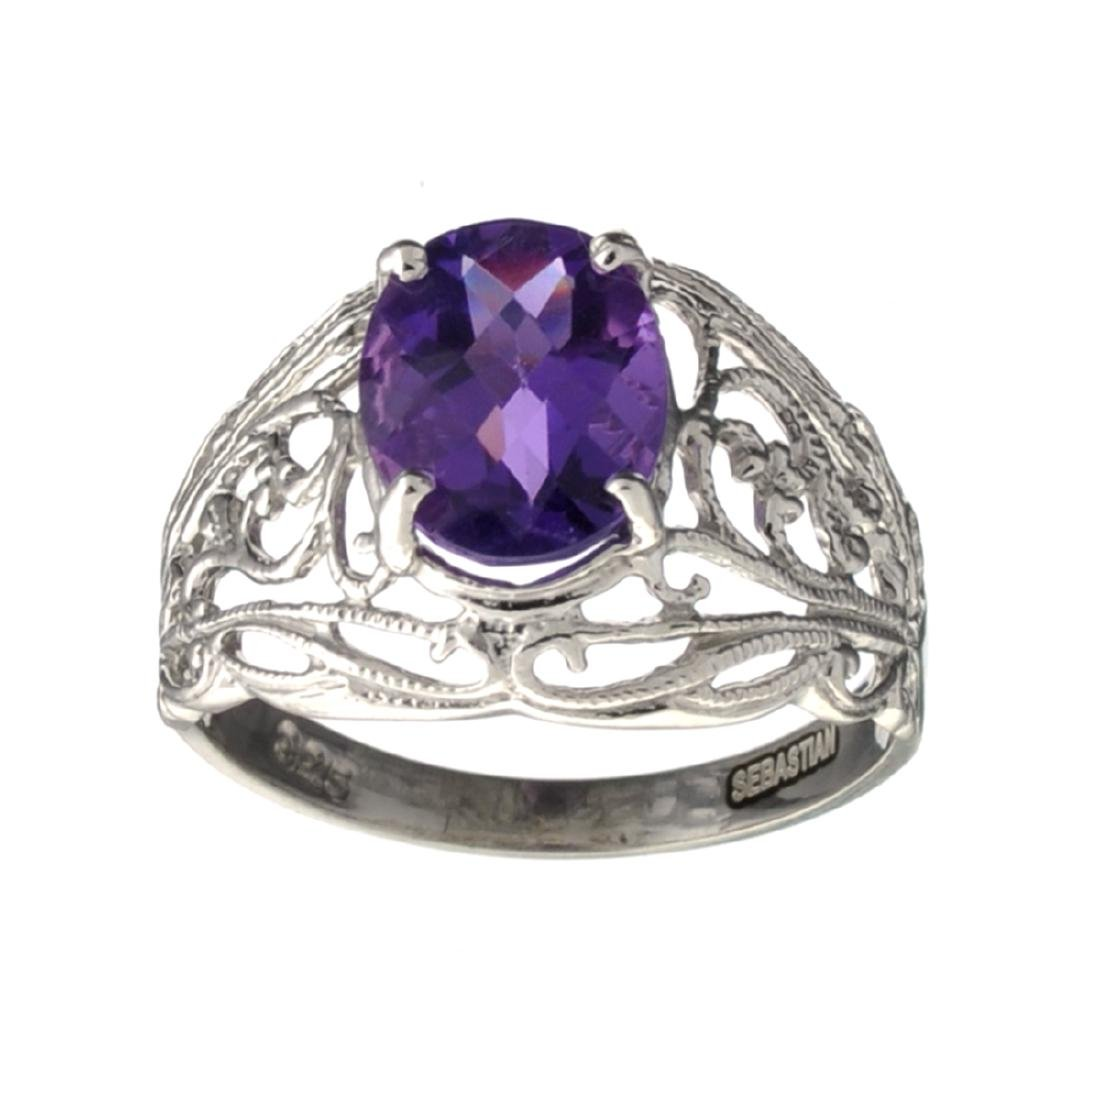 APP: 0.5k Fine Jewelry Designer Sebastian, 2.23CT Oval